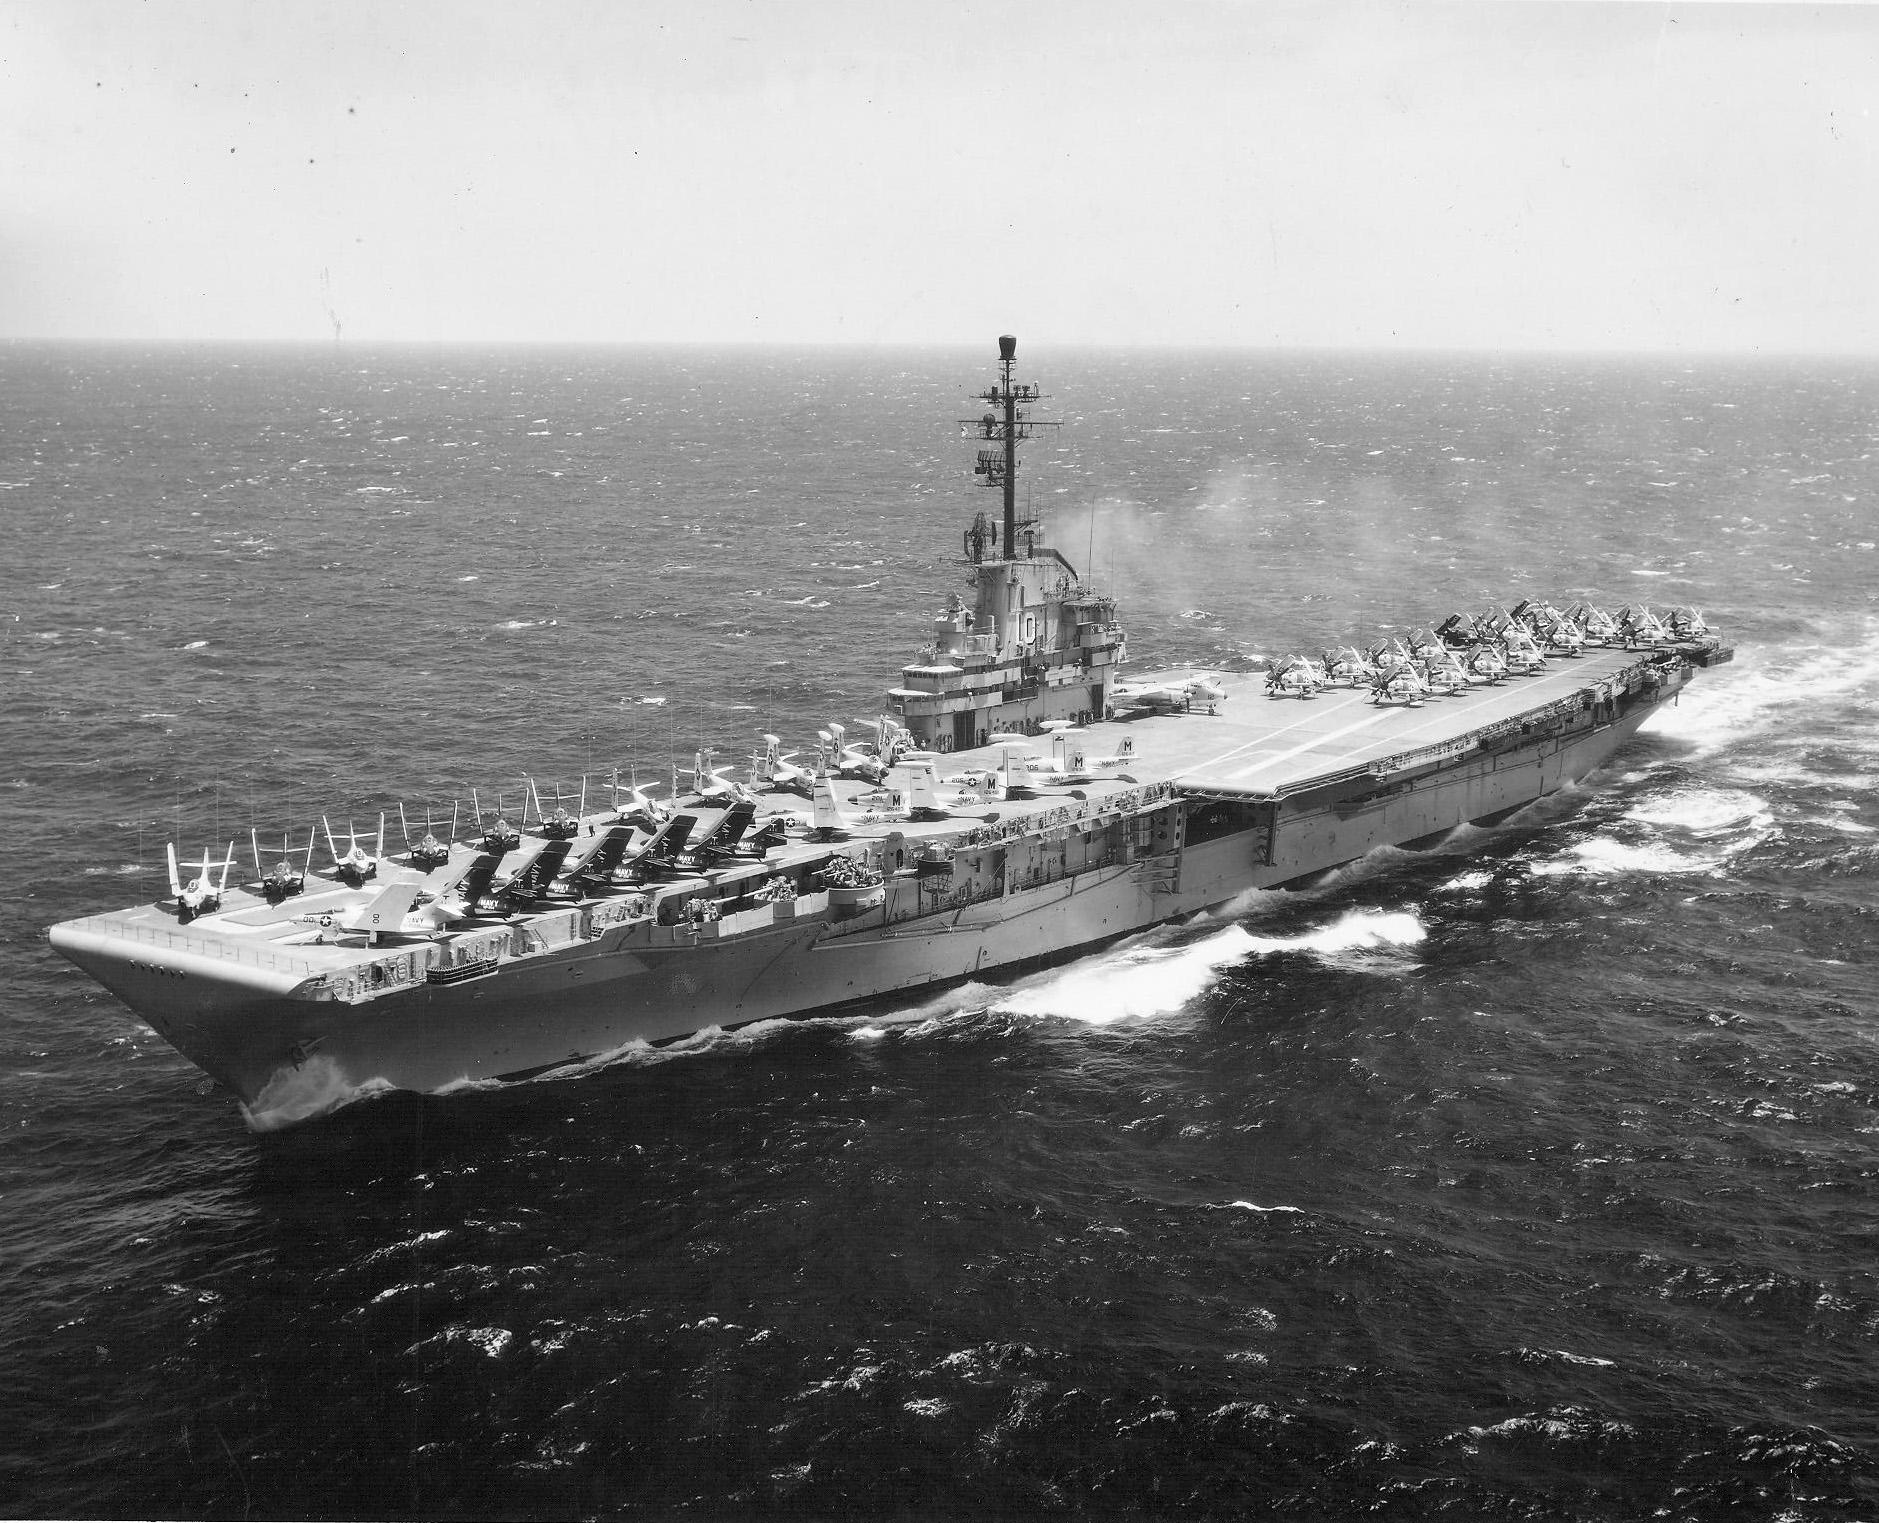 File:USS Yorktown (CVA-10) underway in 1956.jpeg - Wikimedia Commons